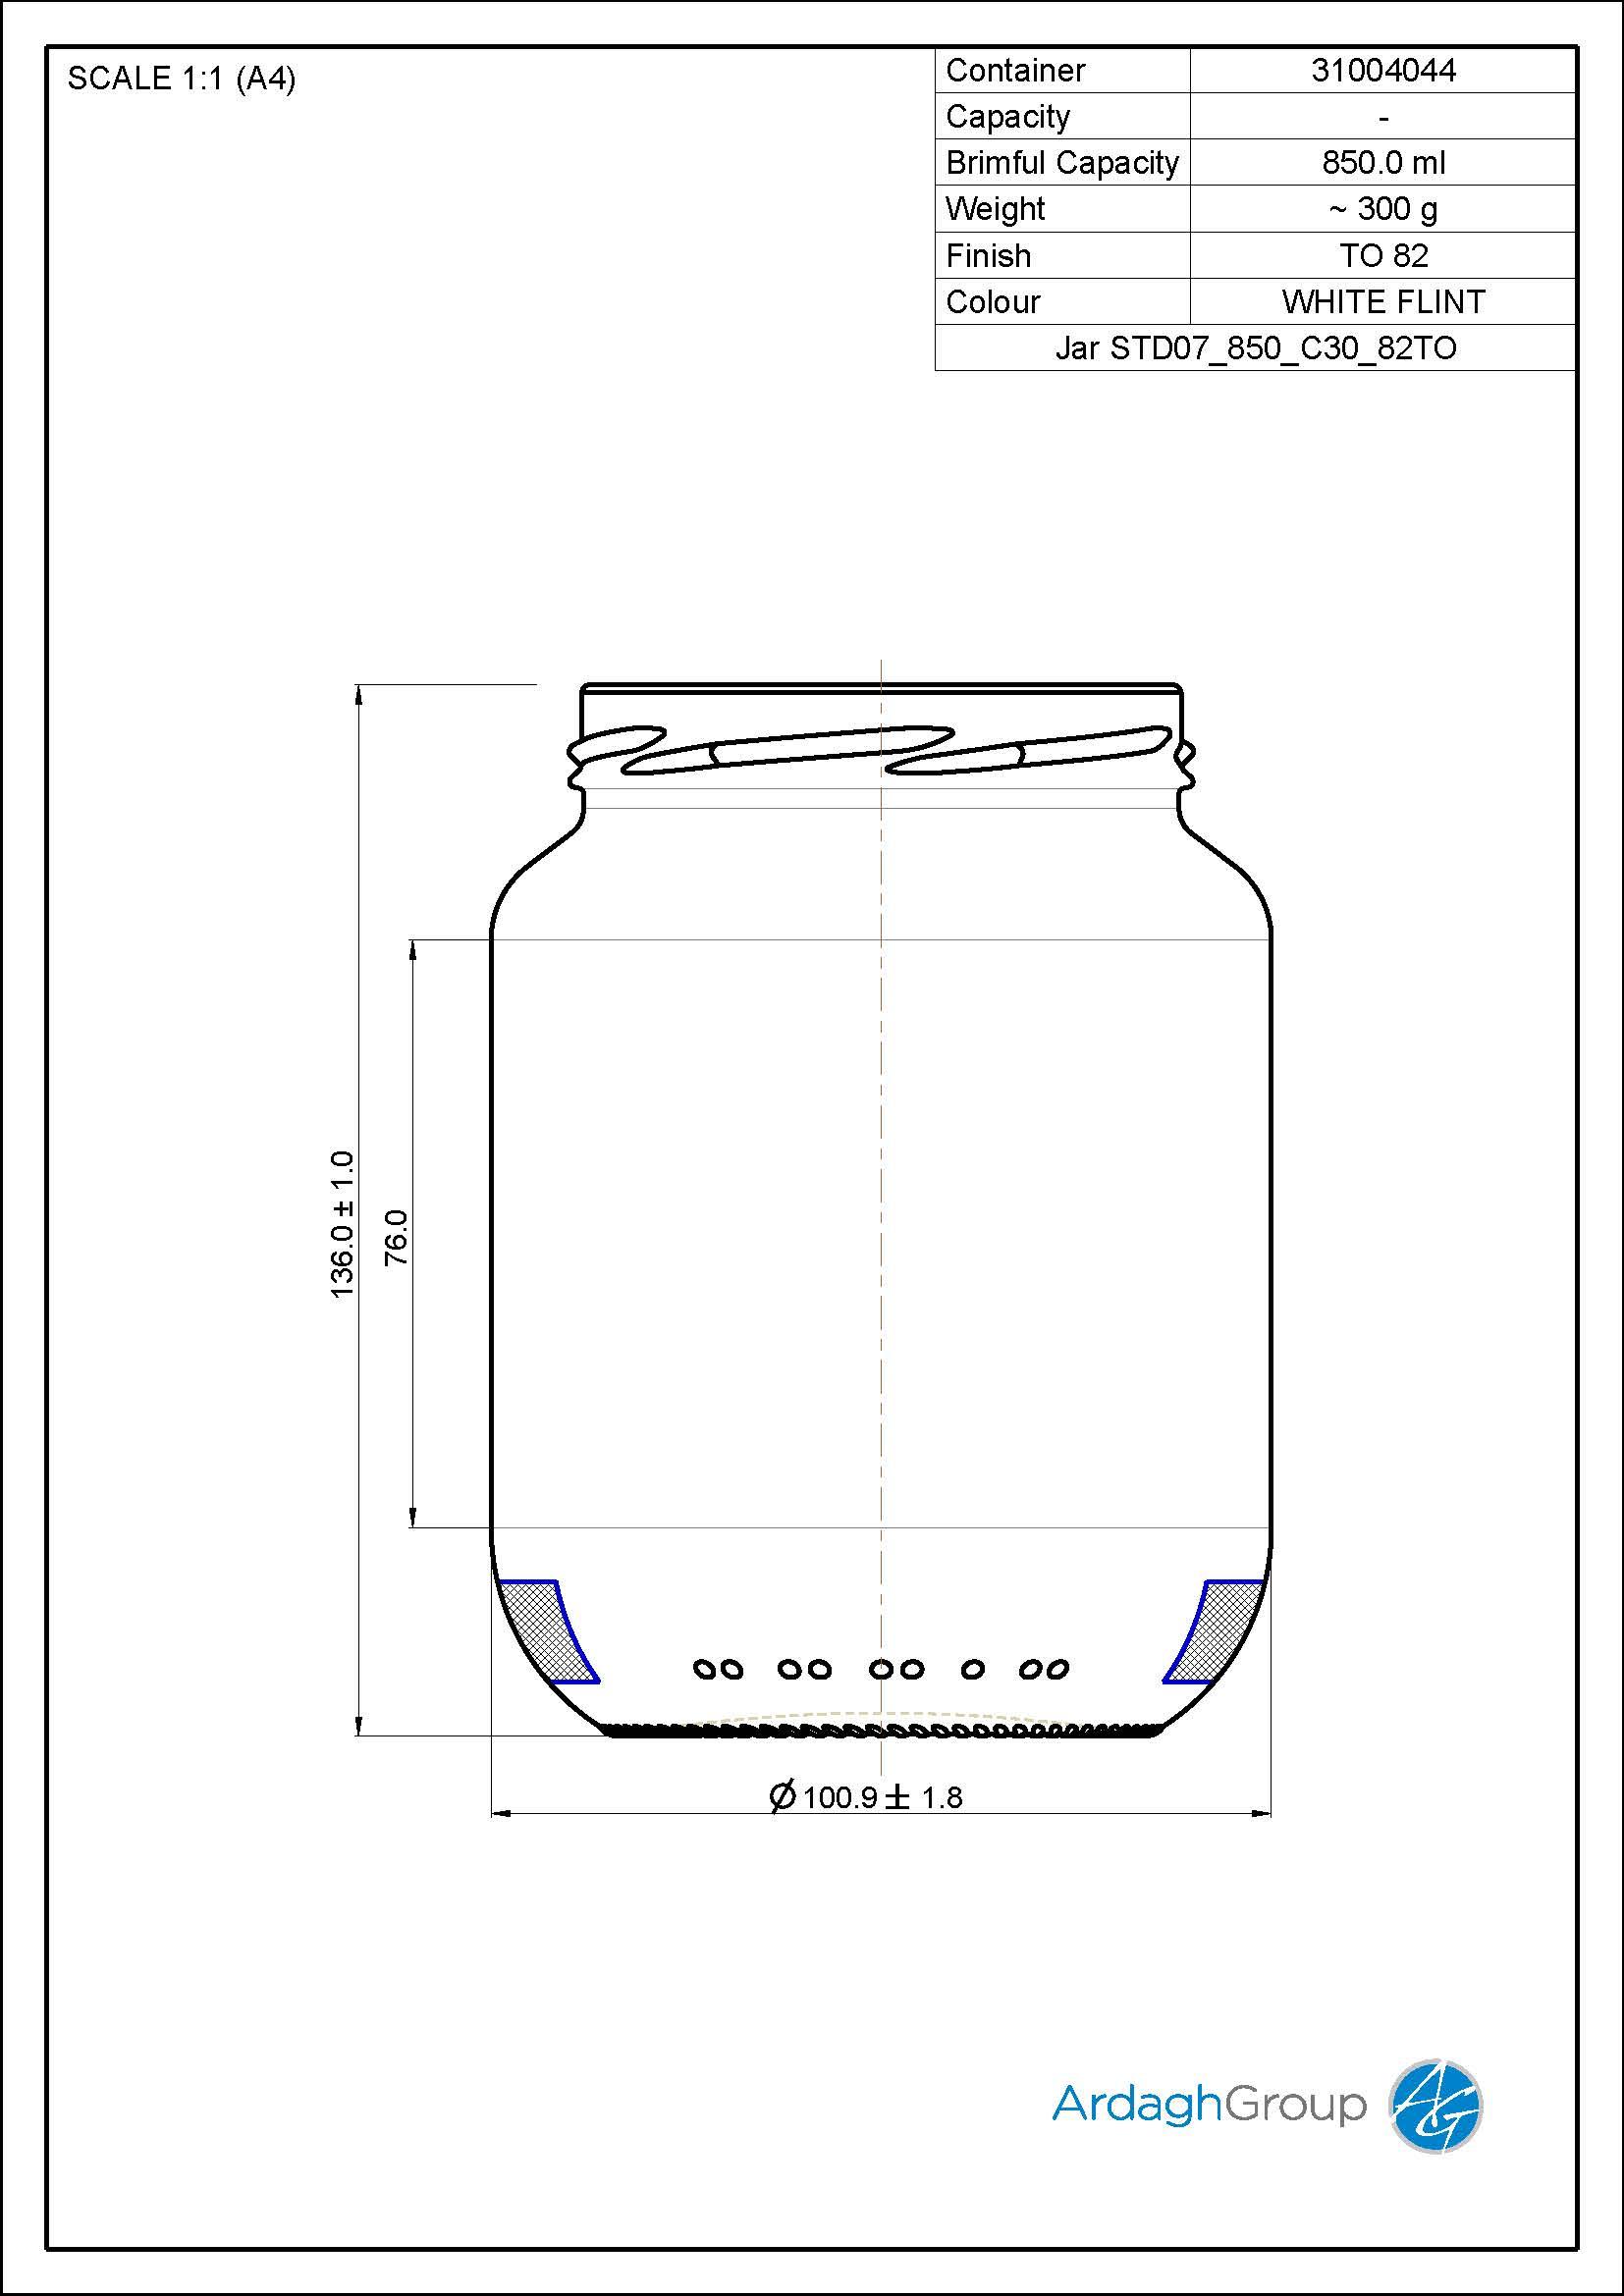 Jar STD07 850 C30 82TO